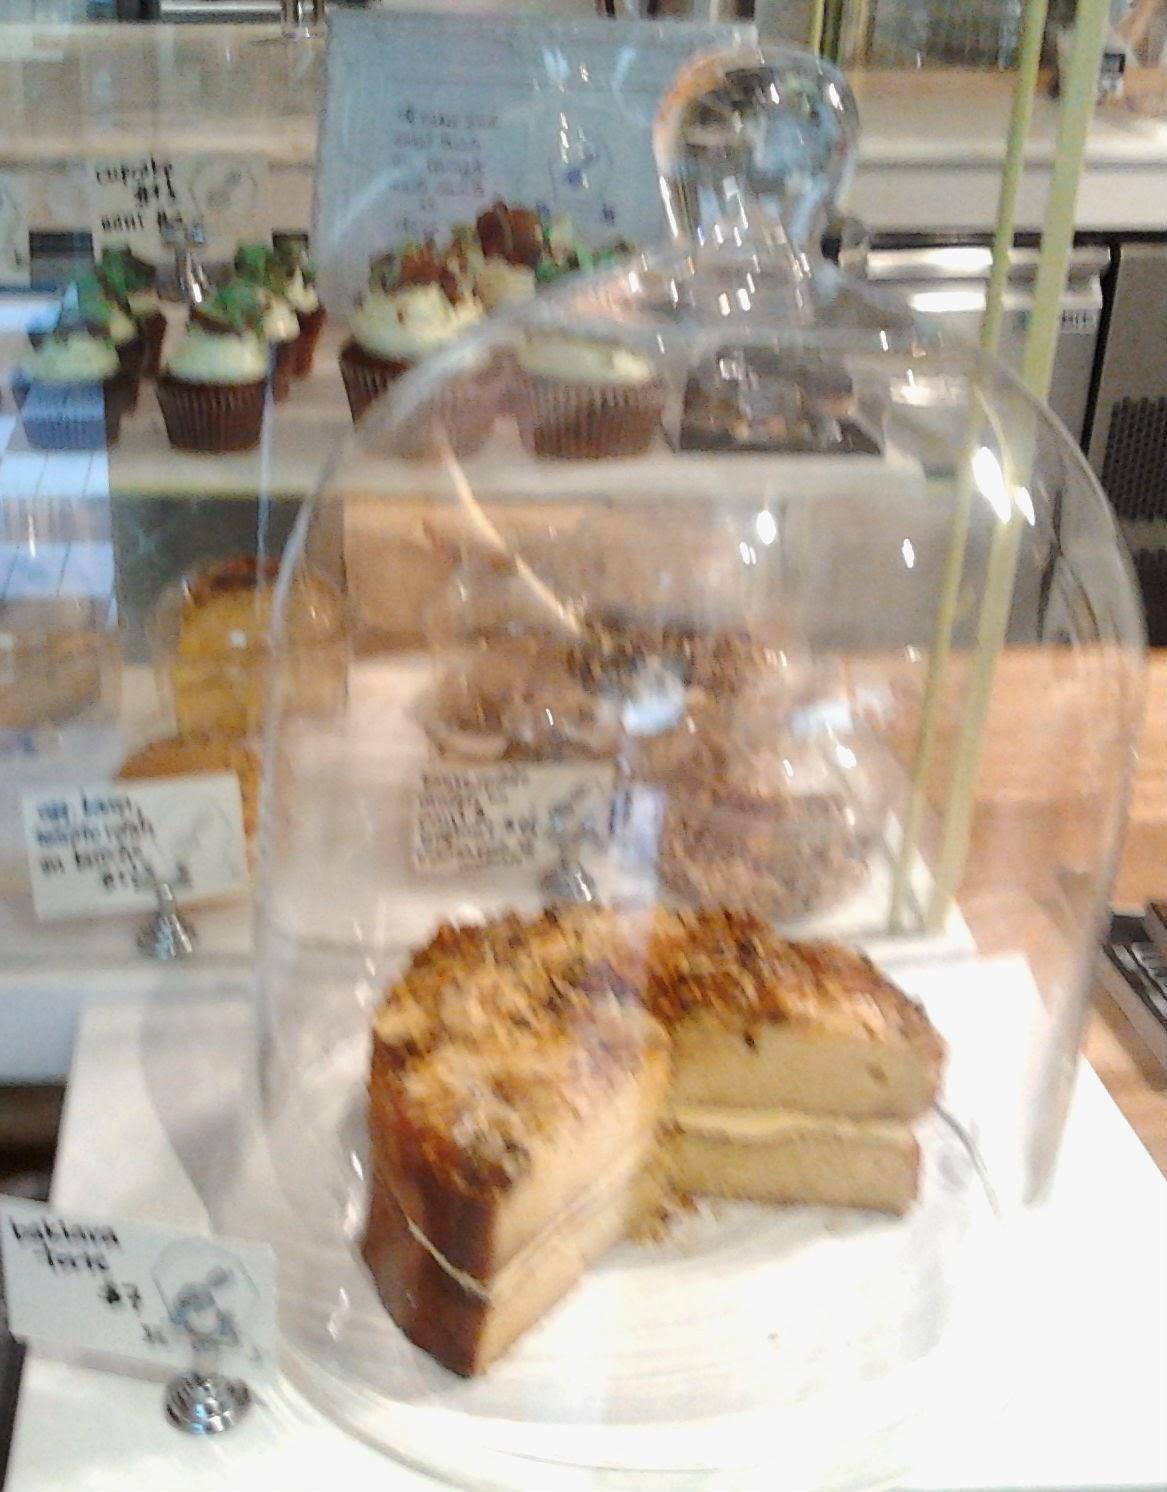 Port Phillip Arcade Cake Shop